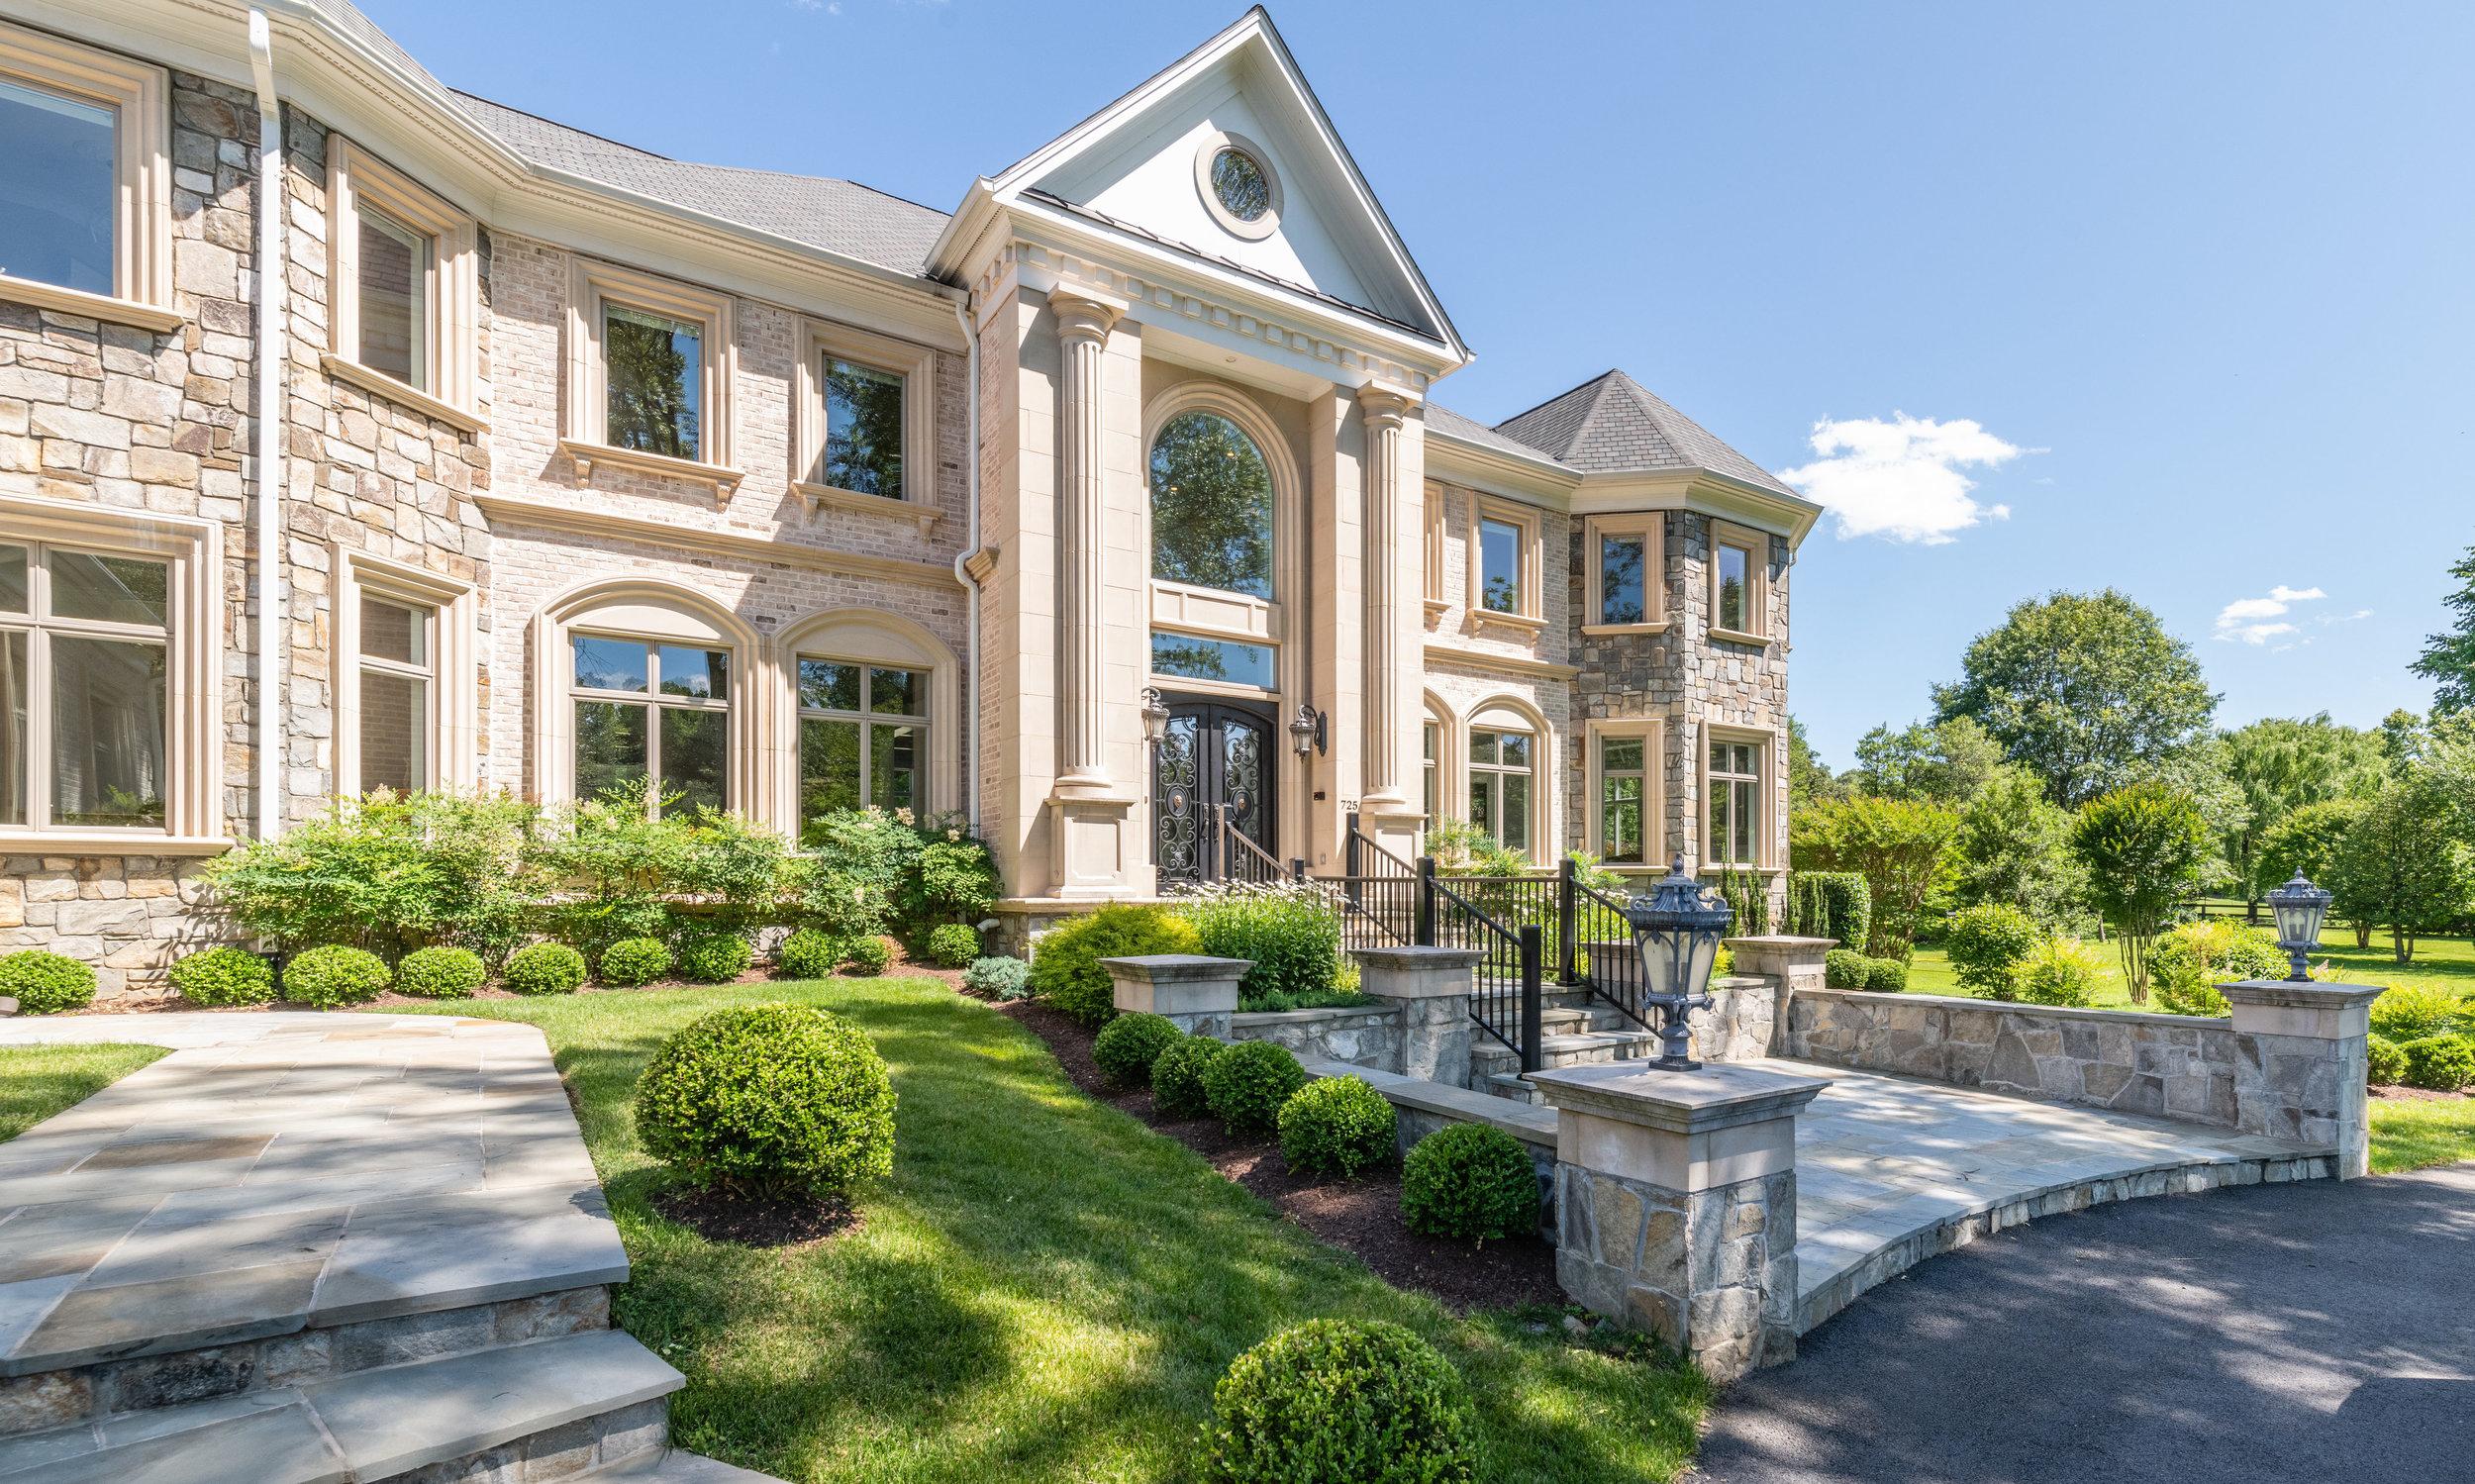 Impressive Great Falls Manor on 2.95 acres